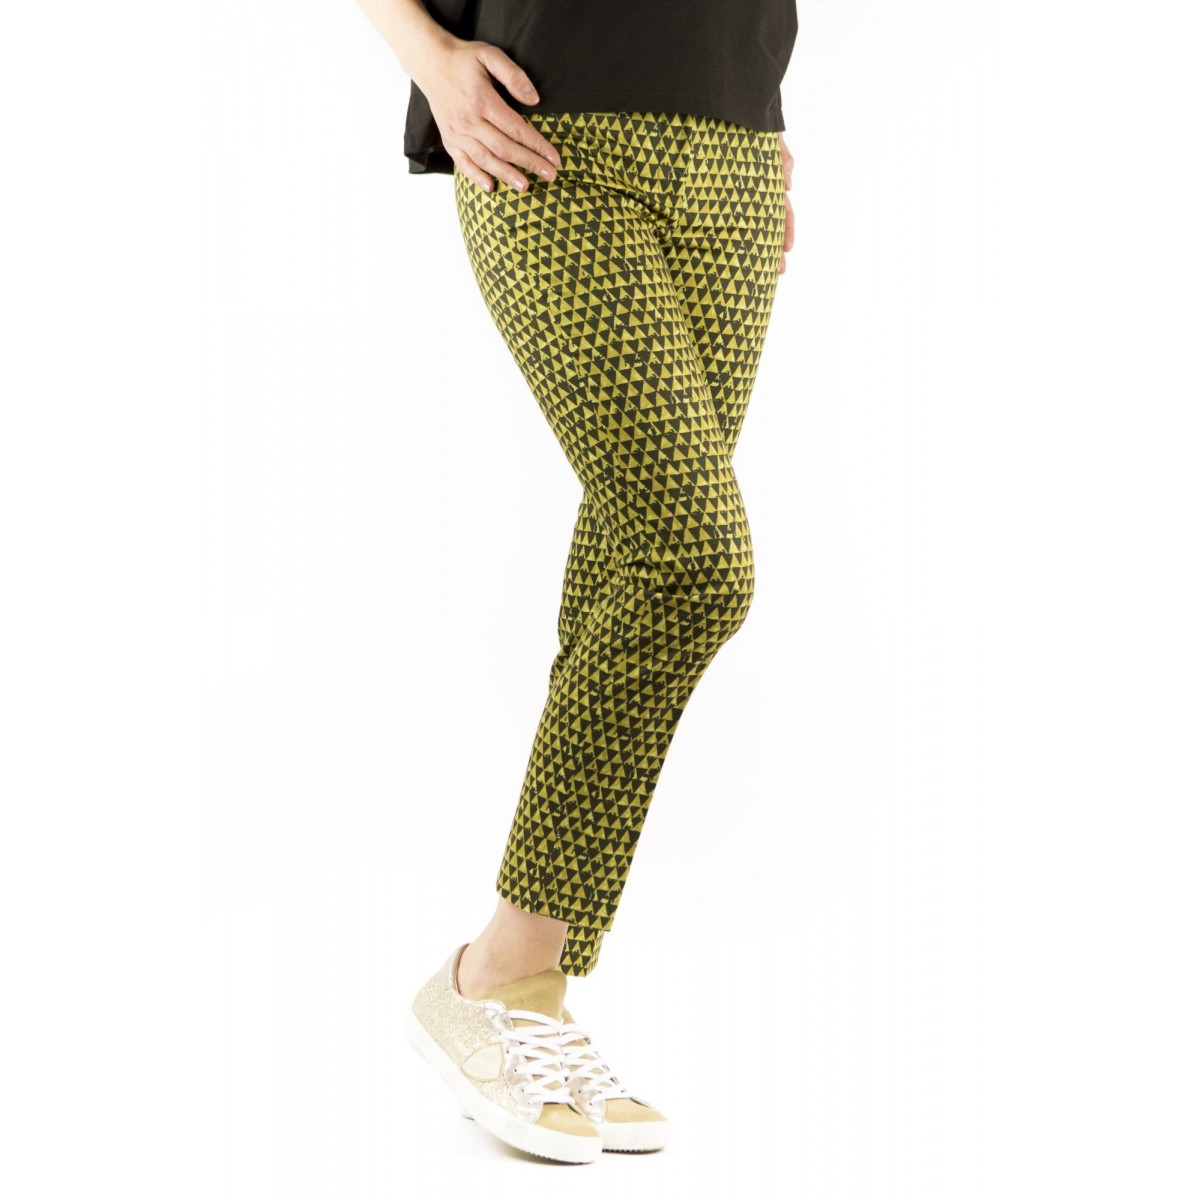 Trousers Incotex Woman - 171522 Debora D6190 Pant Fantasia Geometrica